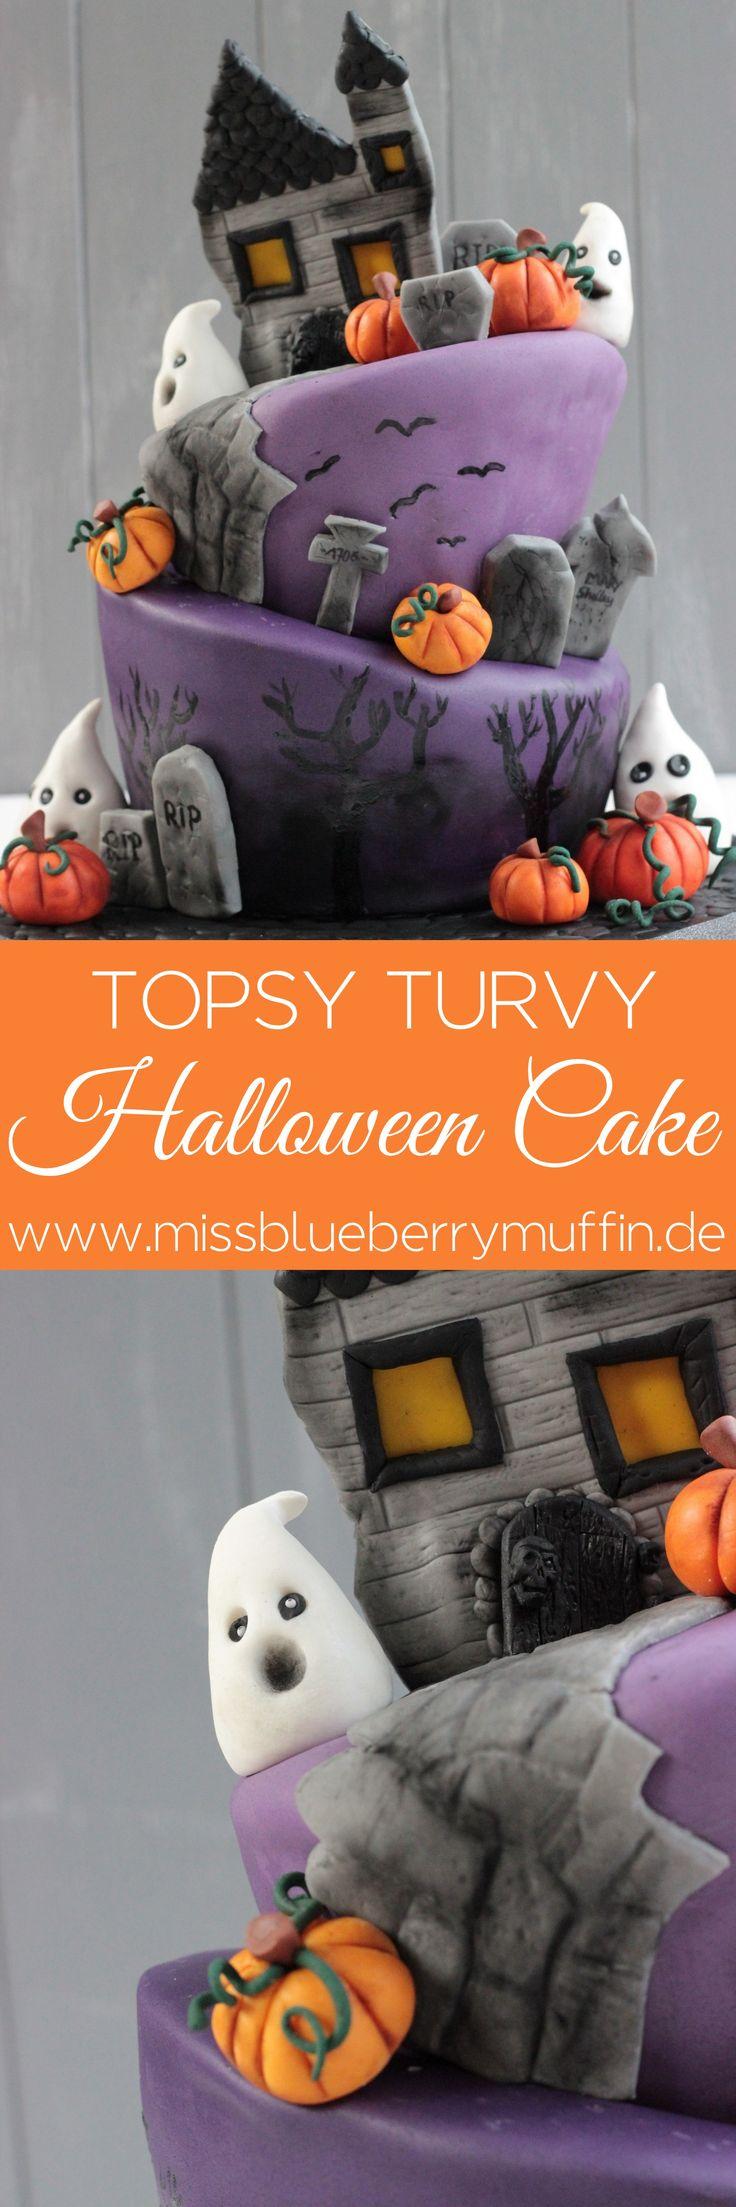 Halloween Motivtorte // Rezept // Torte // Topsy Turvy Cake <3